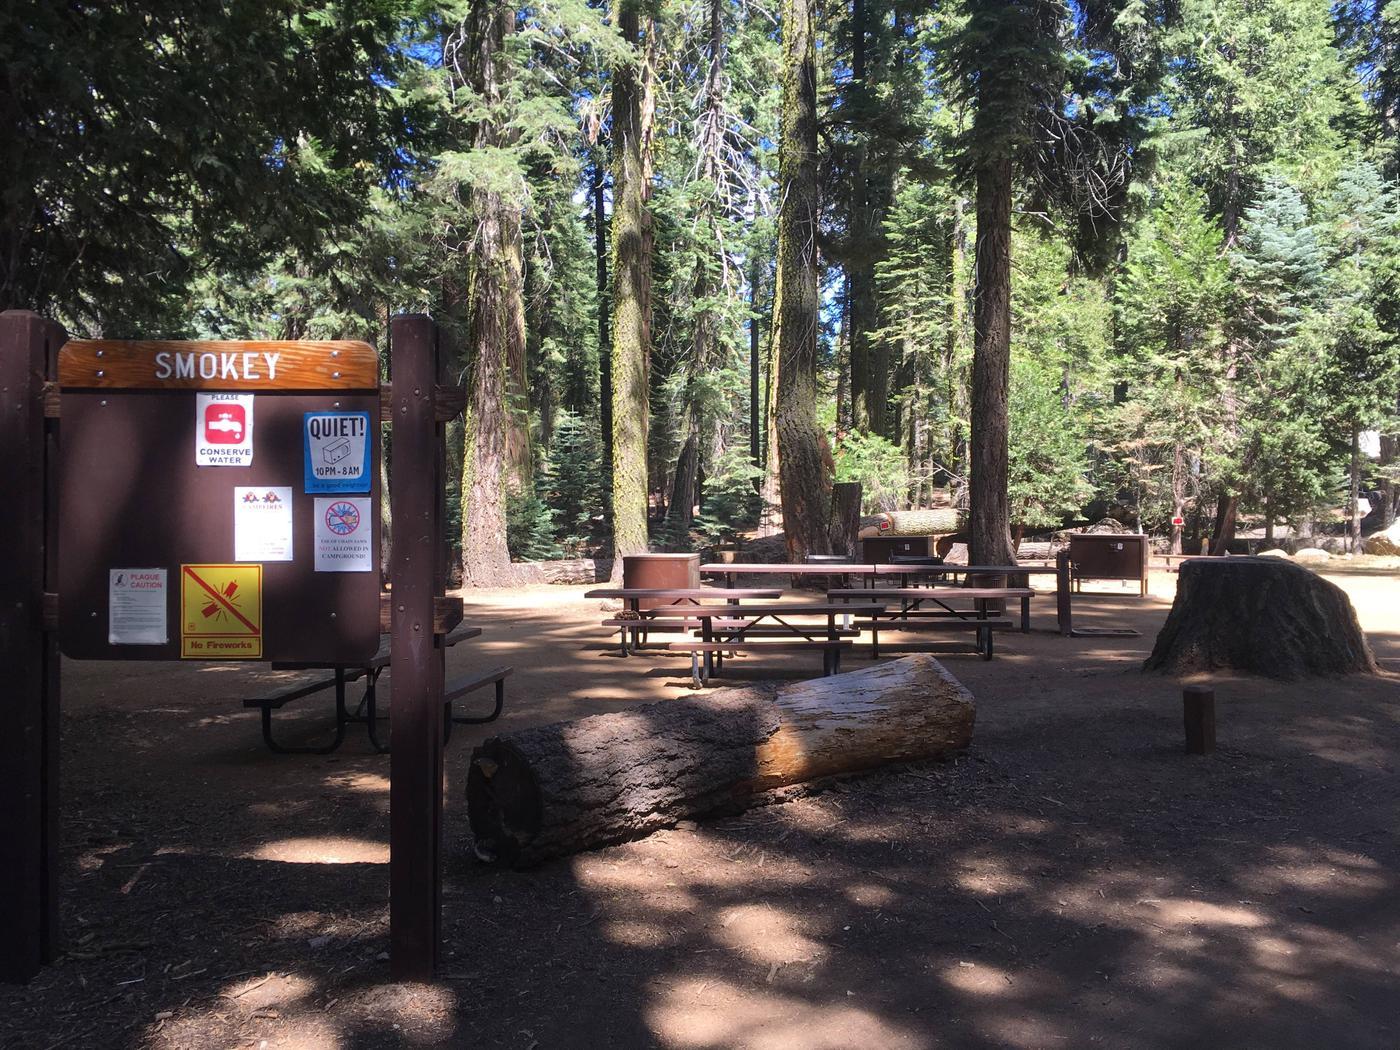 Smokey Campsite